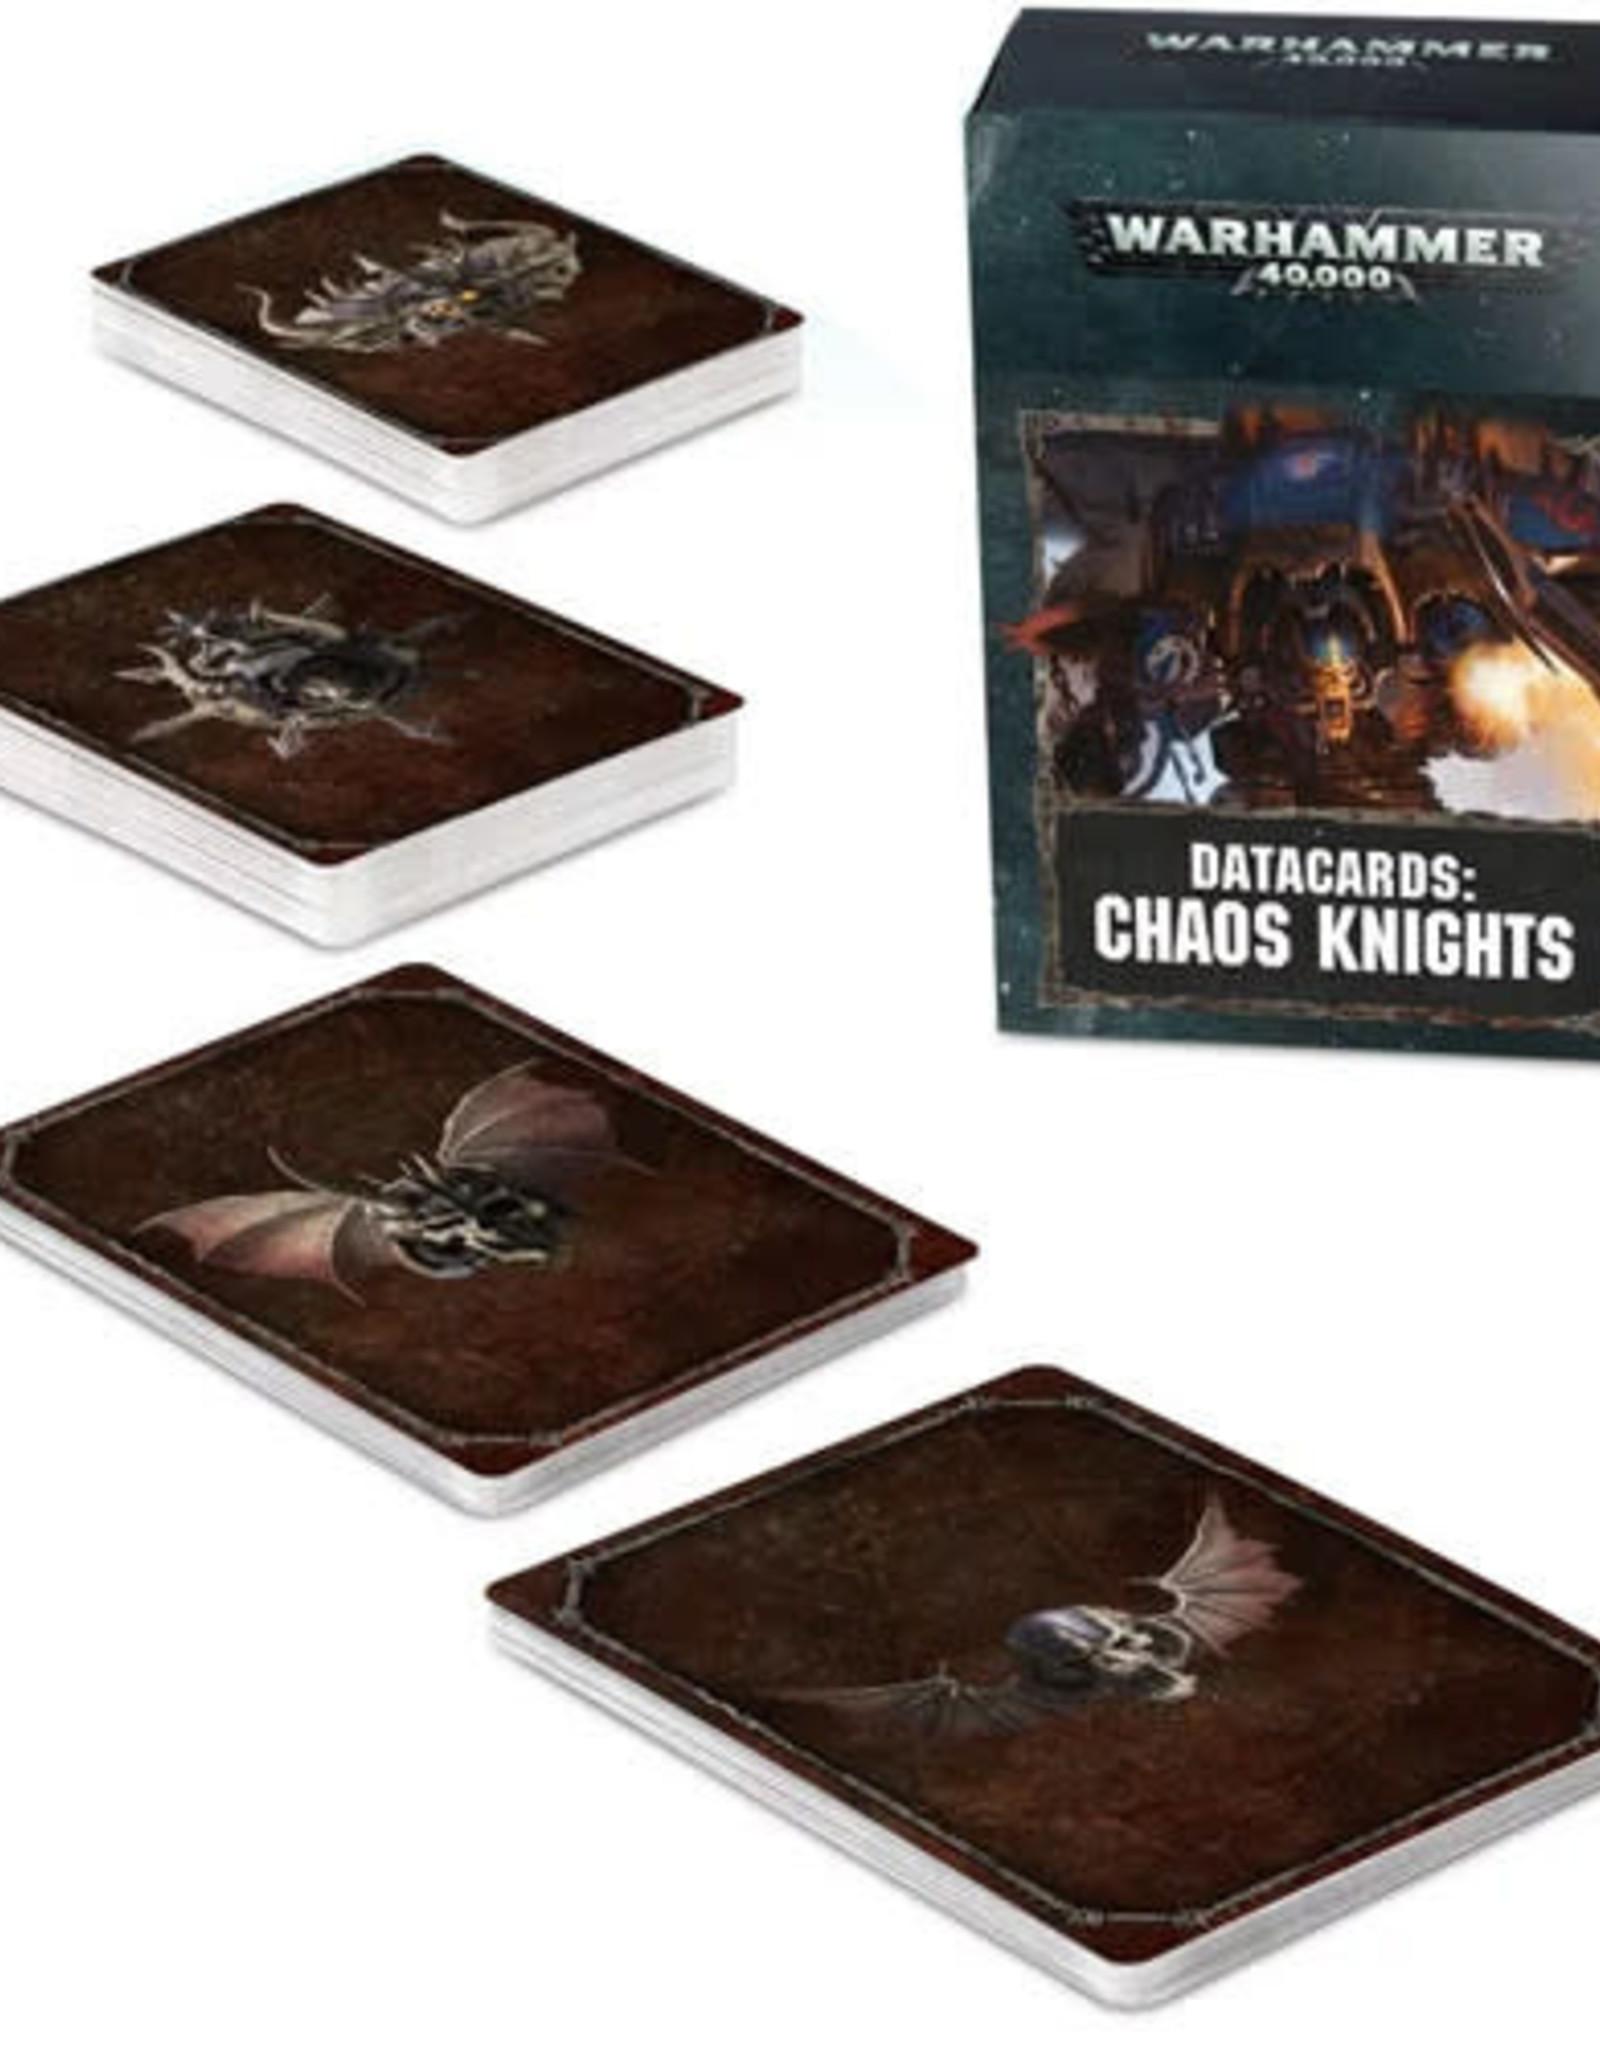 Warhammer 40K Datacards: Chaos Knights